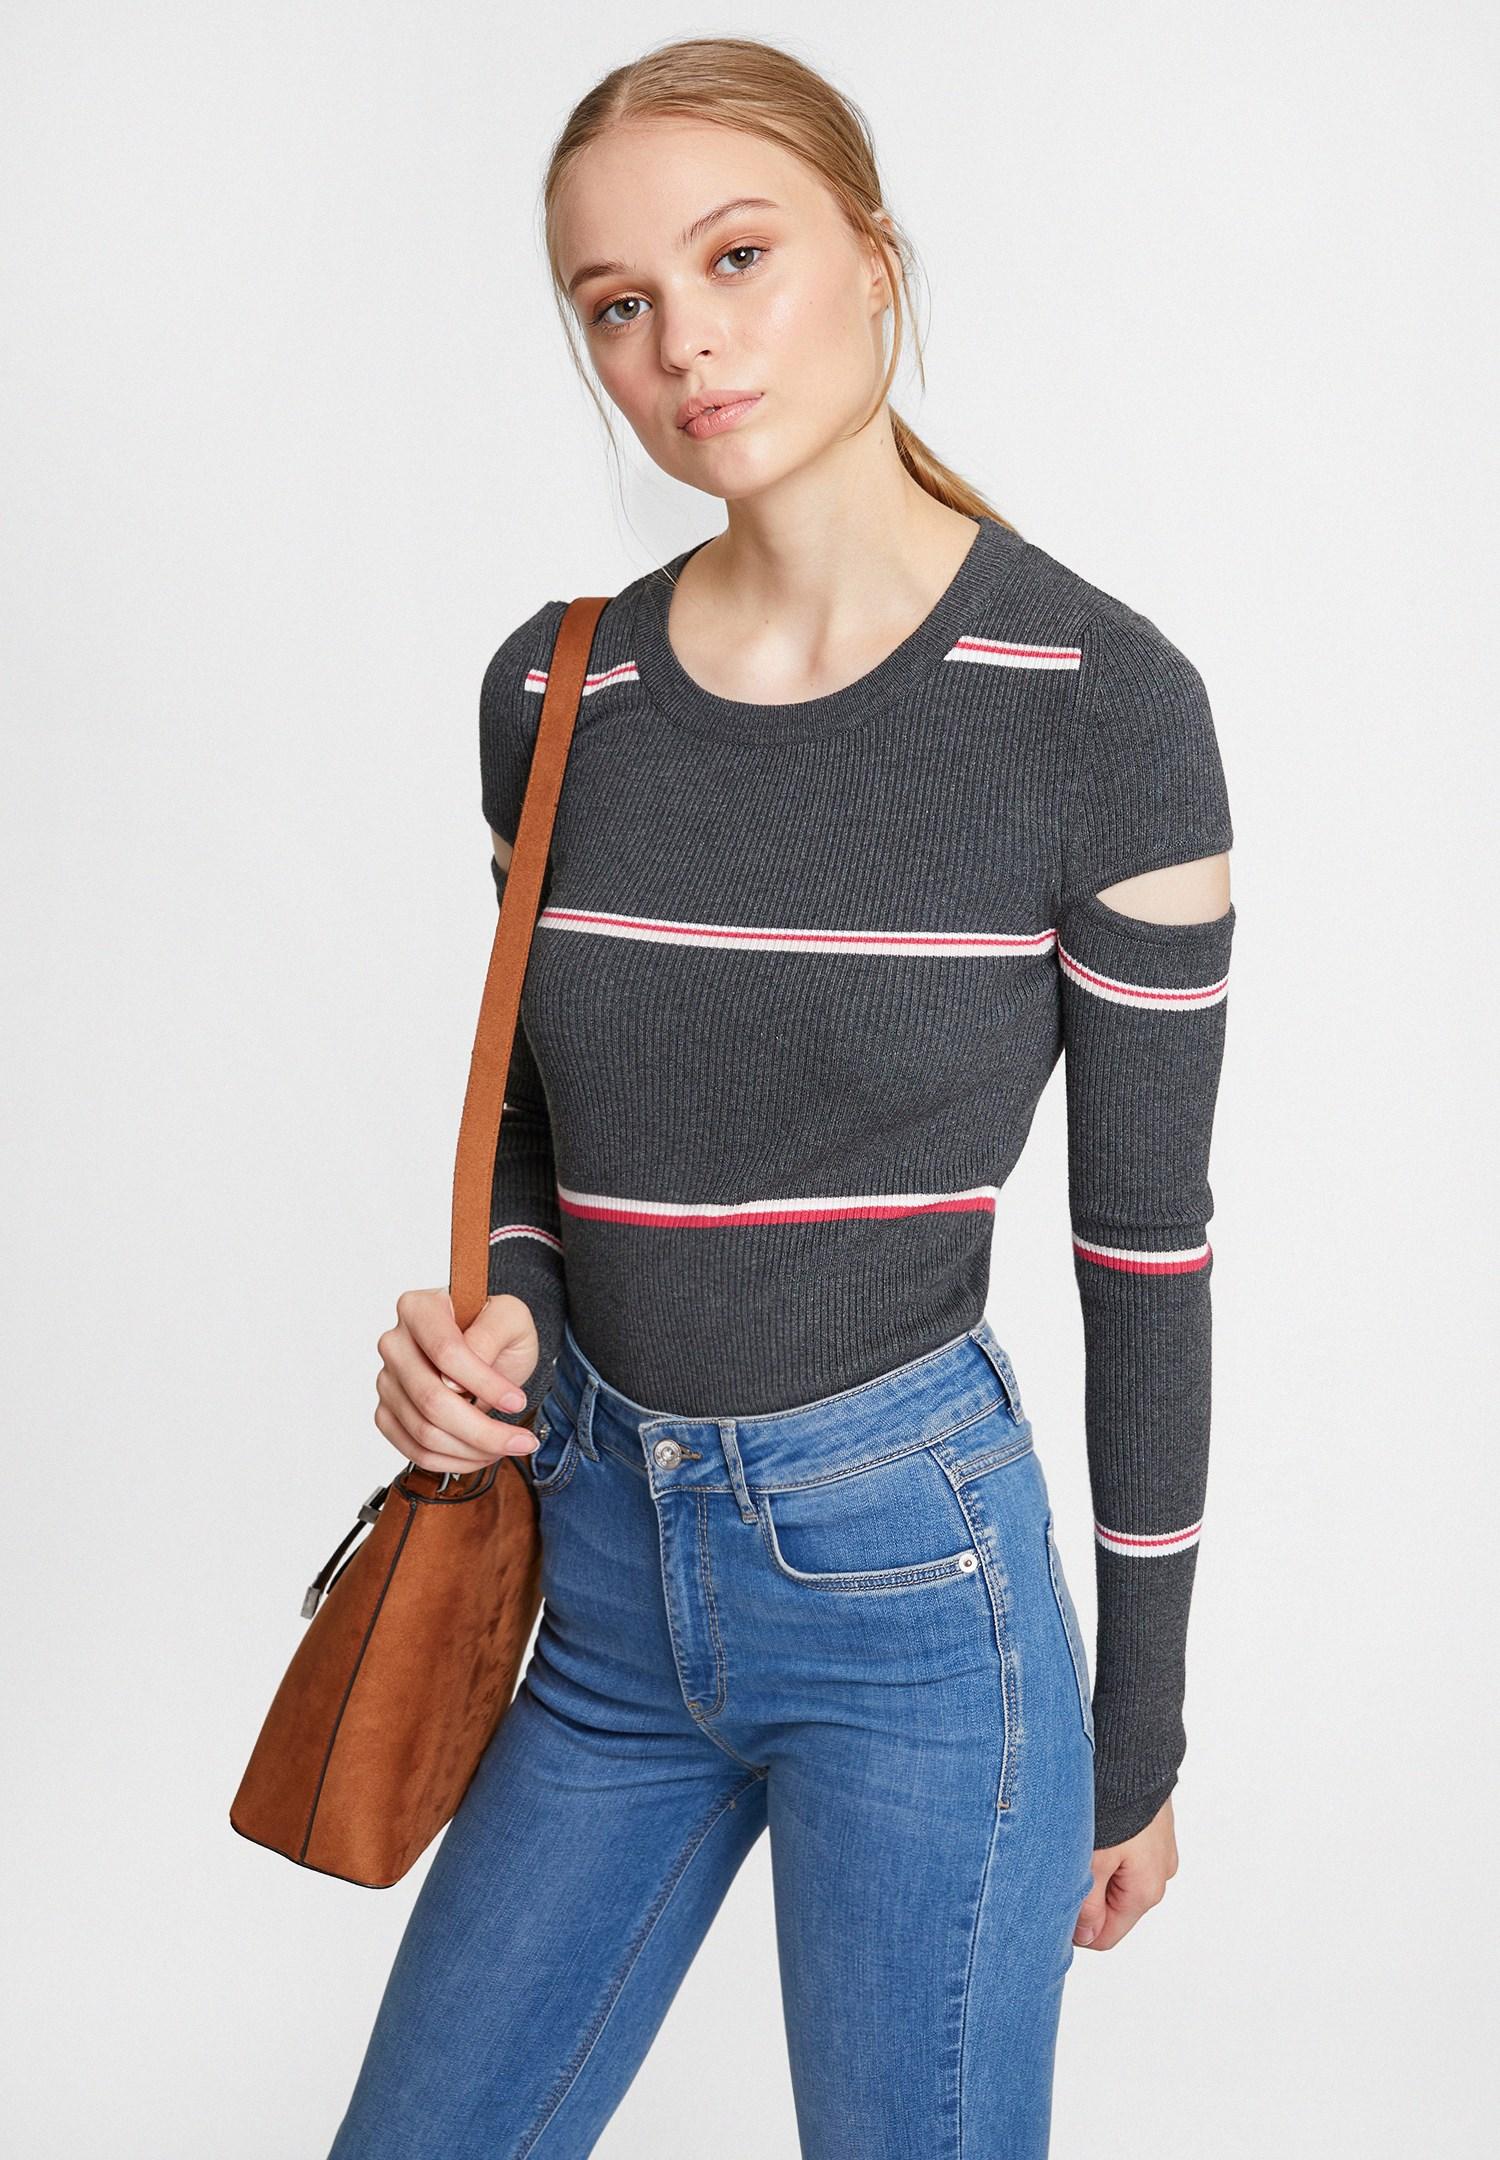 Bayan Çok Renkli Cut Out Detaylı Uzun Kollu Triko